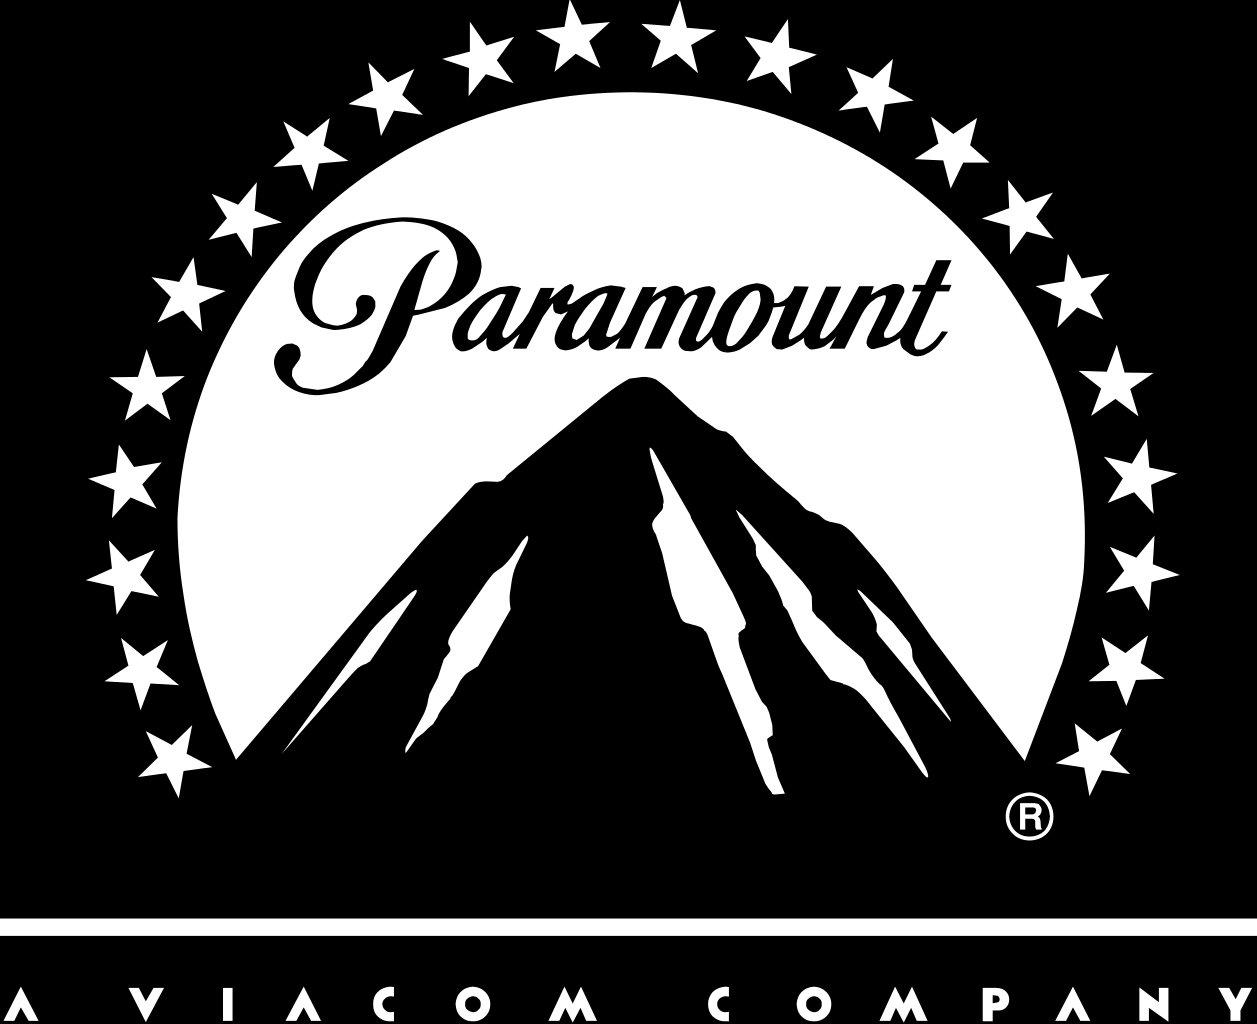 paramount logo  paramount symbol  meaning  history and dvd logo hits corner dvd logo transparent background